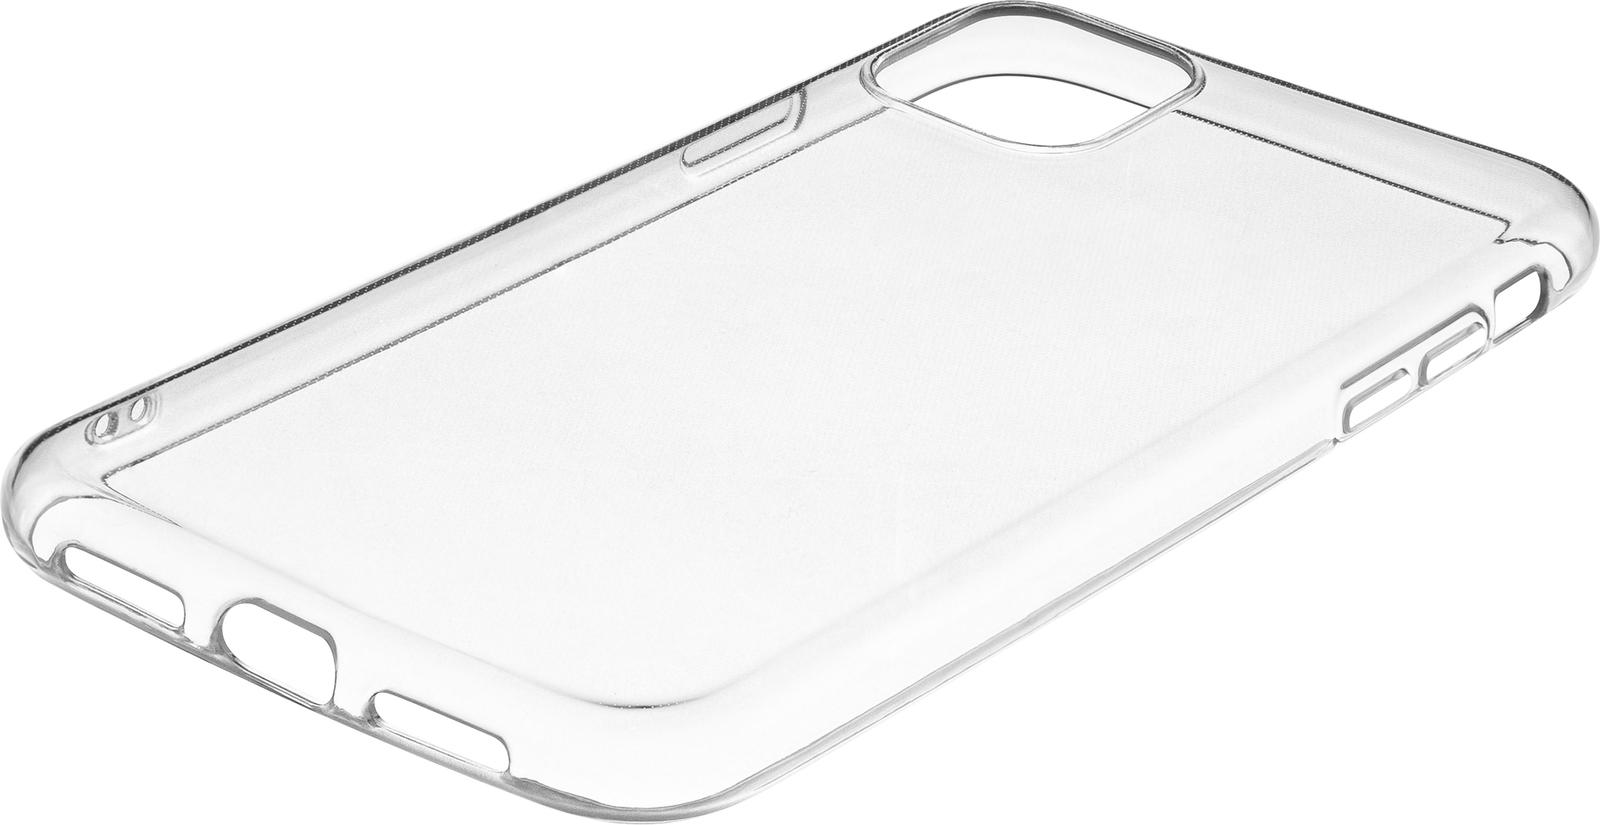 Sandberg Cover iPhone 11 Soft Clear  406-55 - eet01